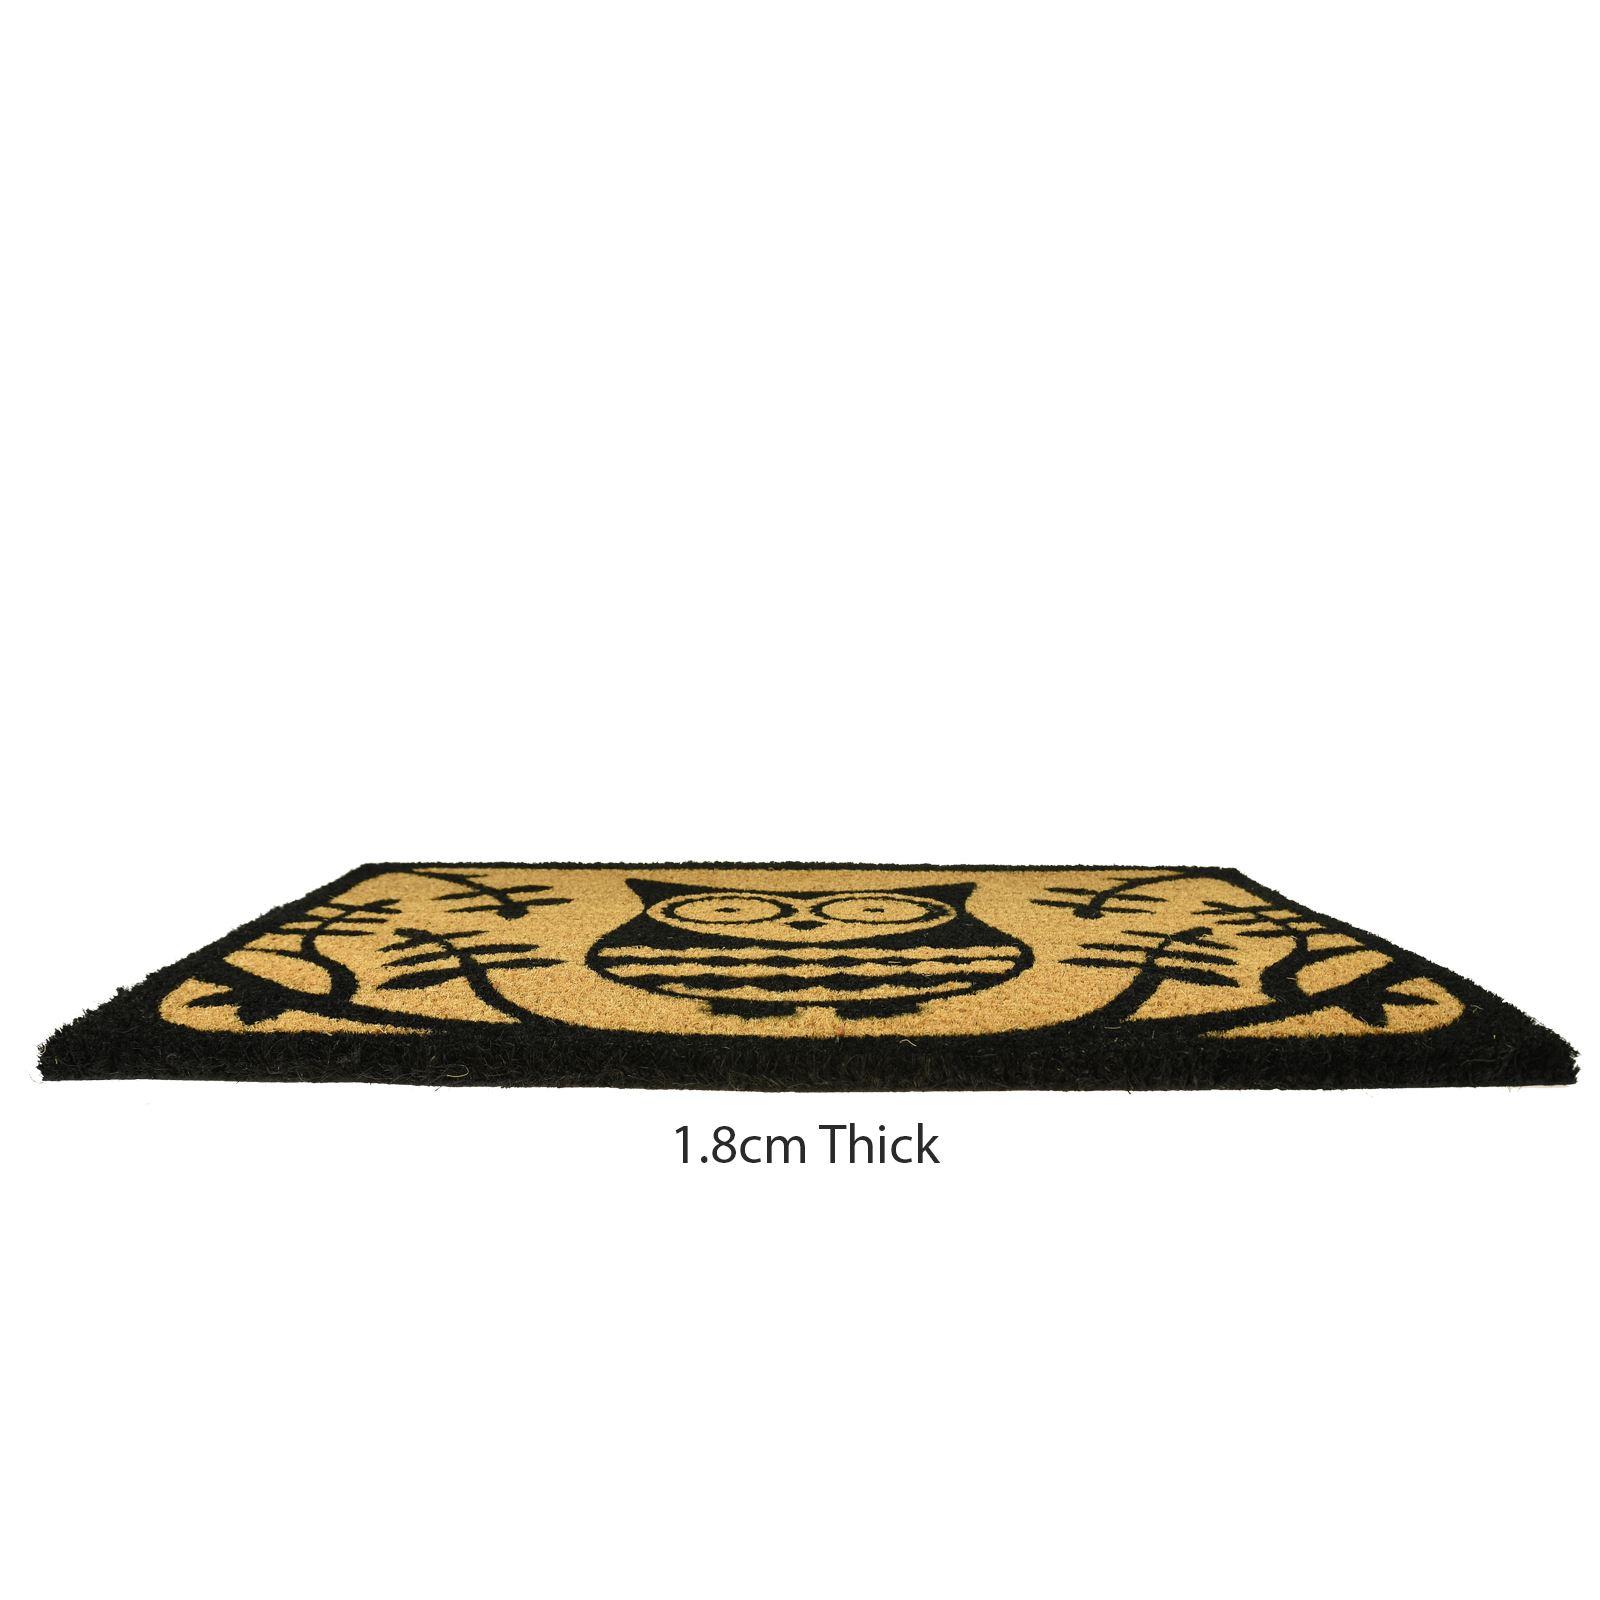 Plain-Non-Slip-Door-Mat-Tough-Natural-Coir-PVC-Back-Welcome-Doormat-40-x-60cm miniatura 92